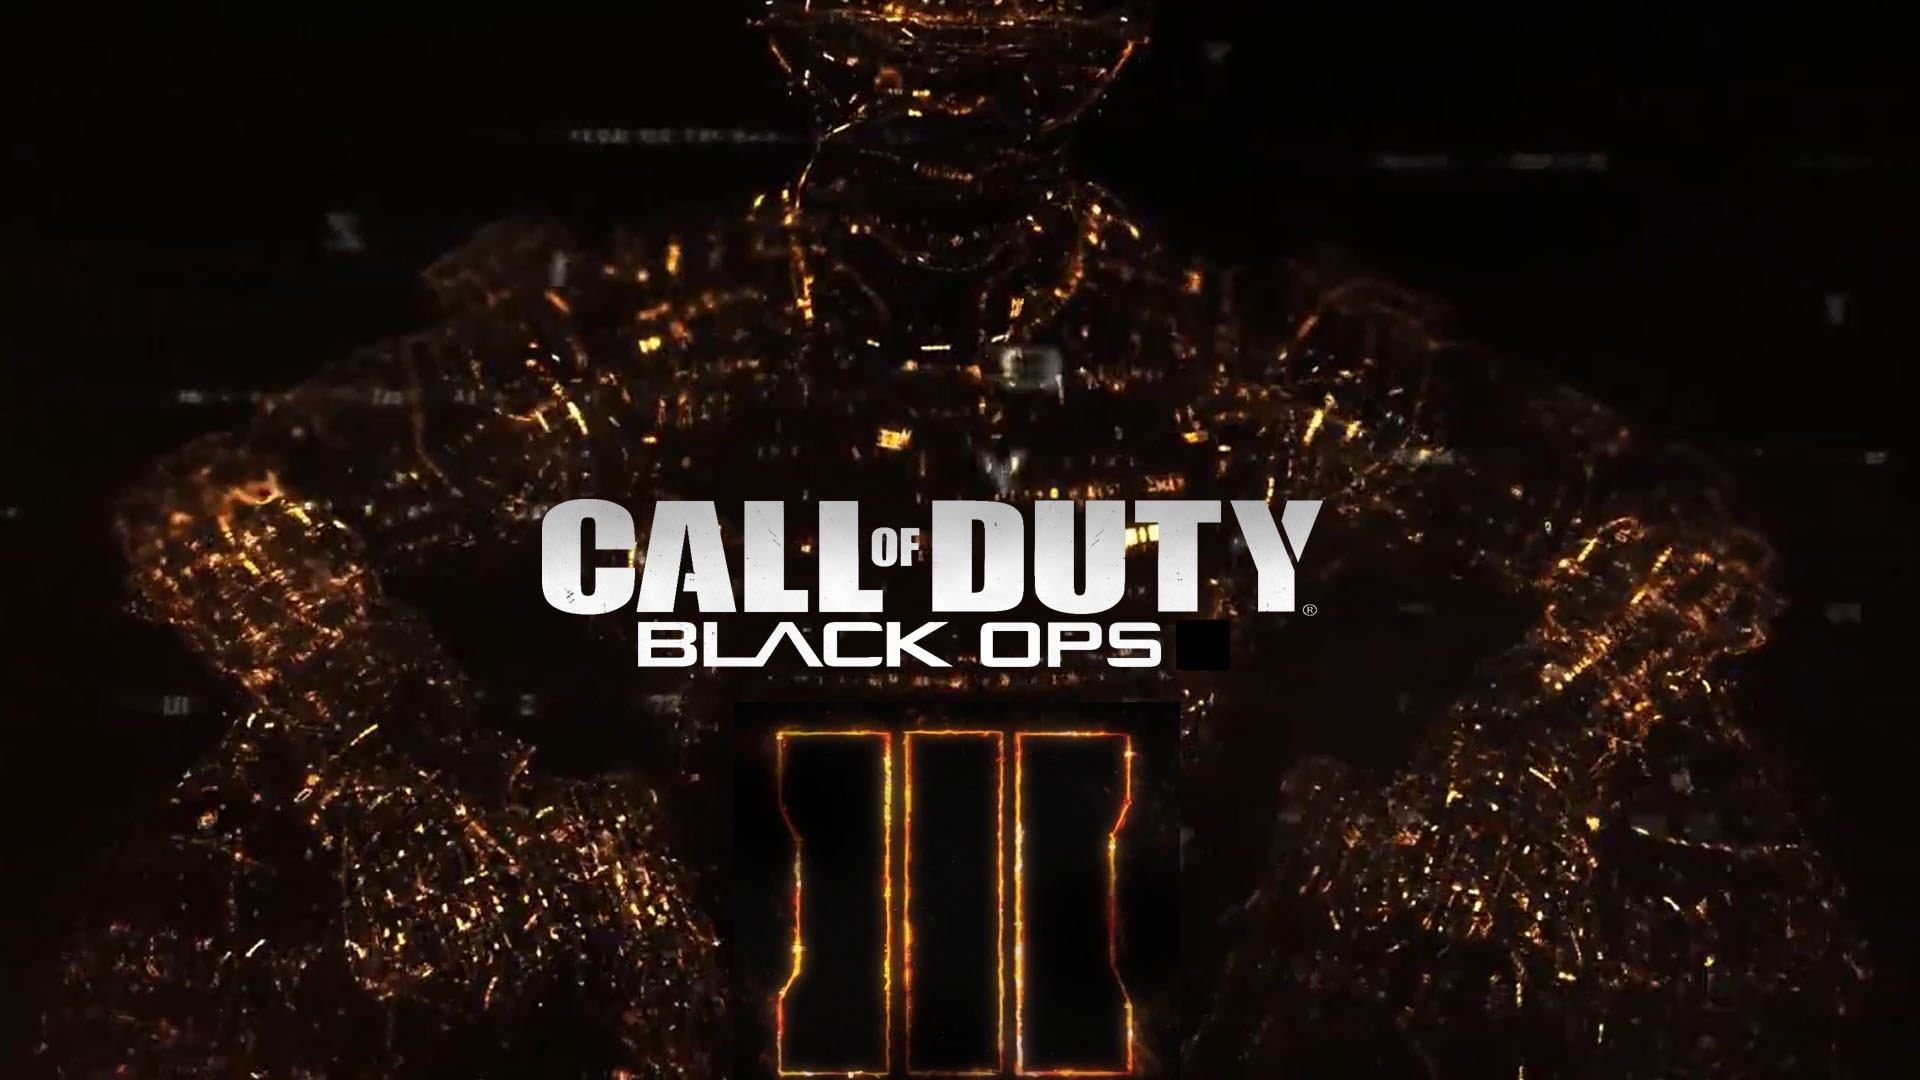 black ops 2 zombies wallpaper hd 1080p